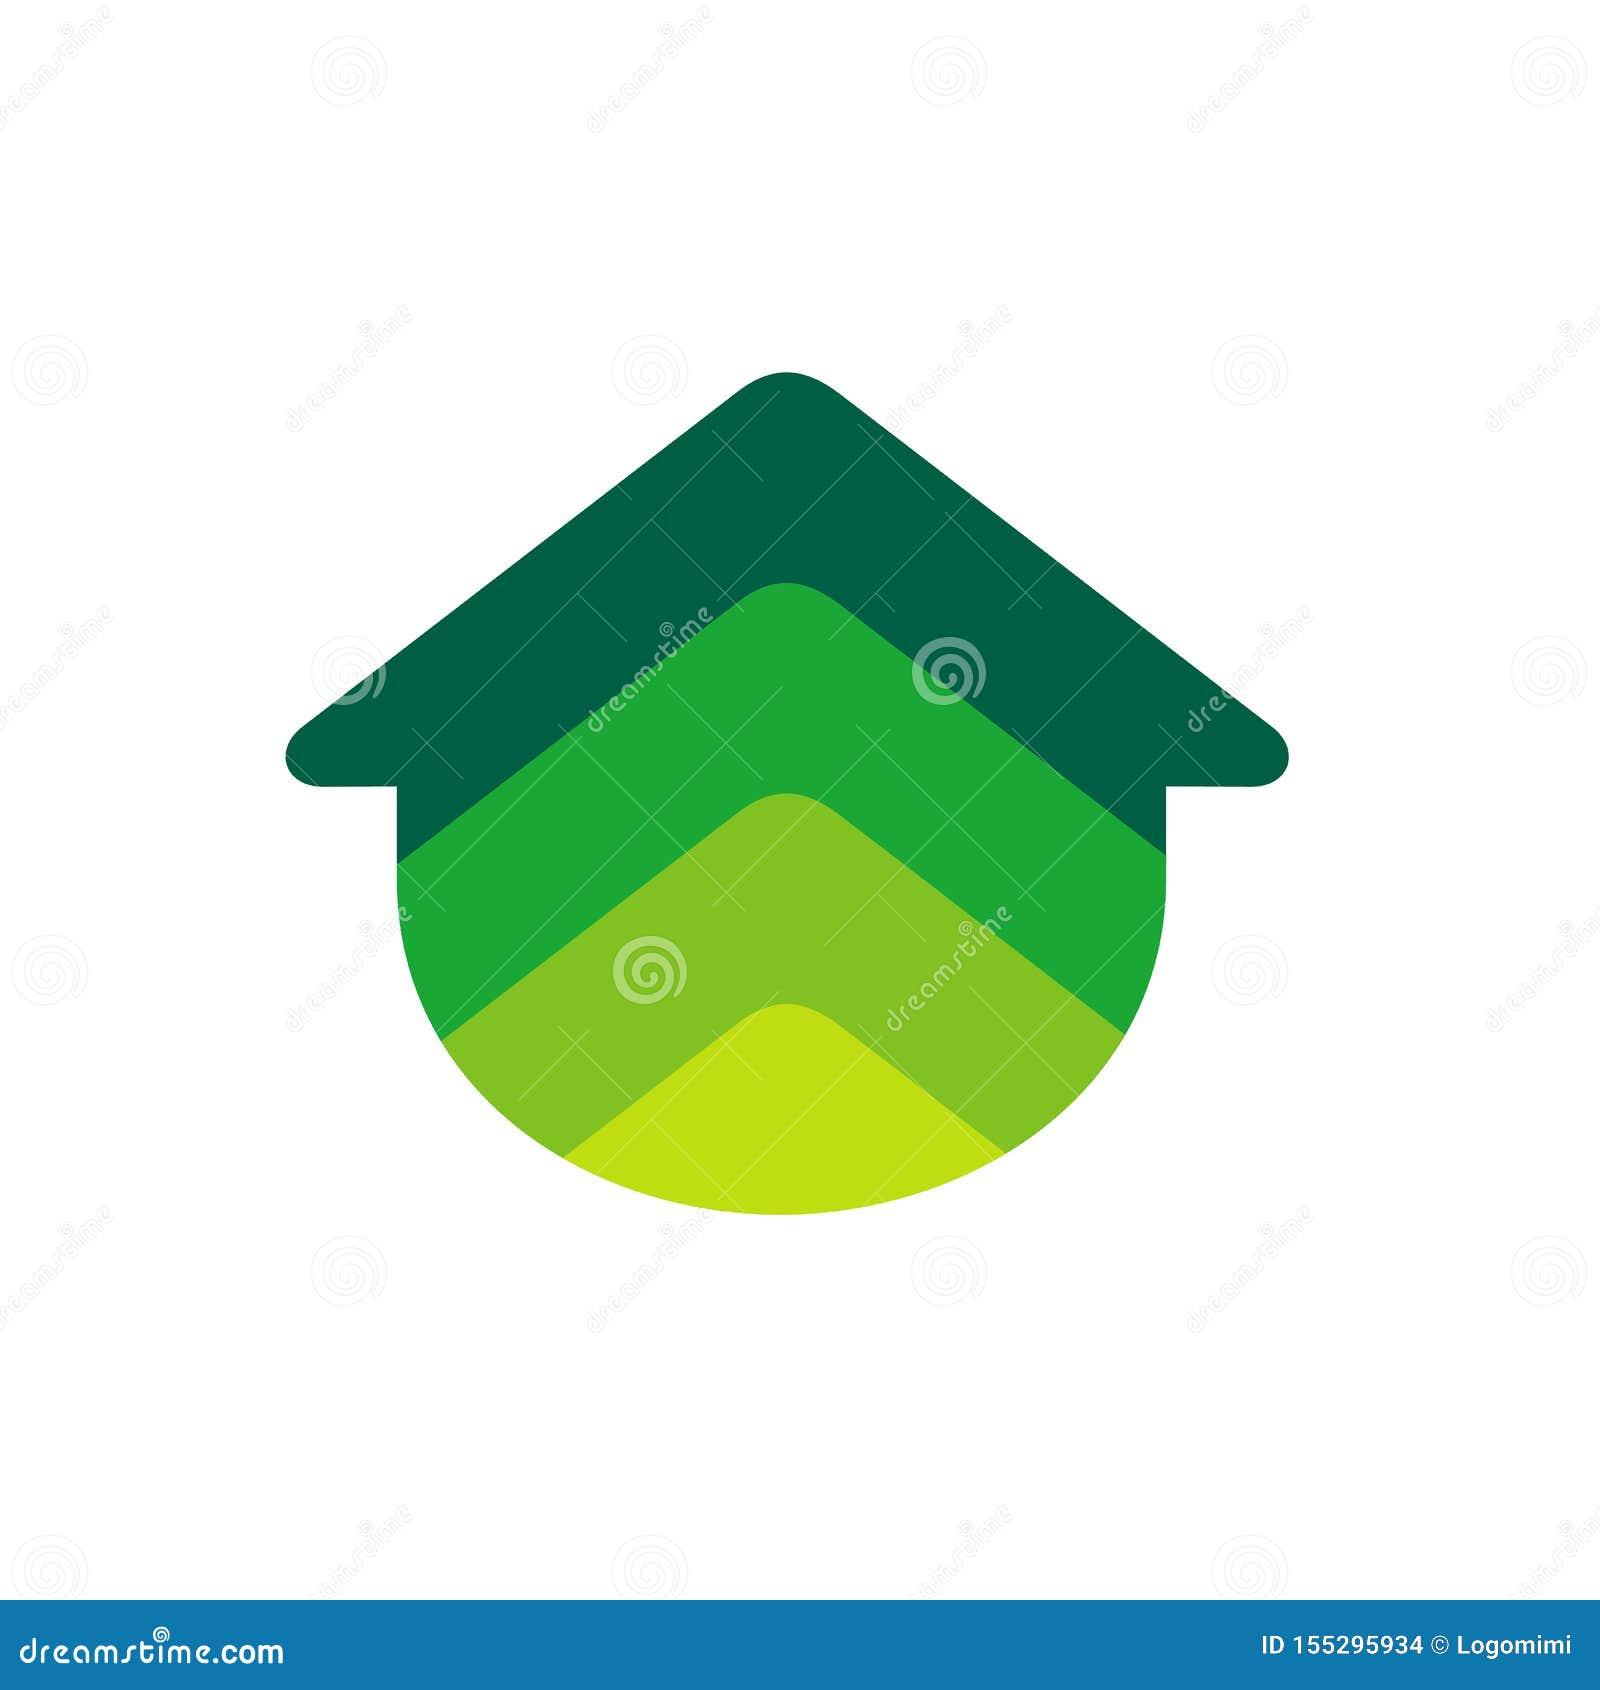 Home Logo Icon. Real Estate Logo in Colorful Gradient Design Concept. Green Color Vector Illustration